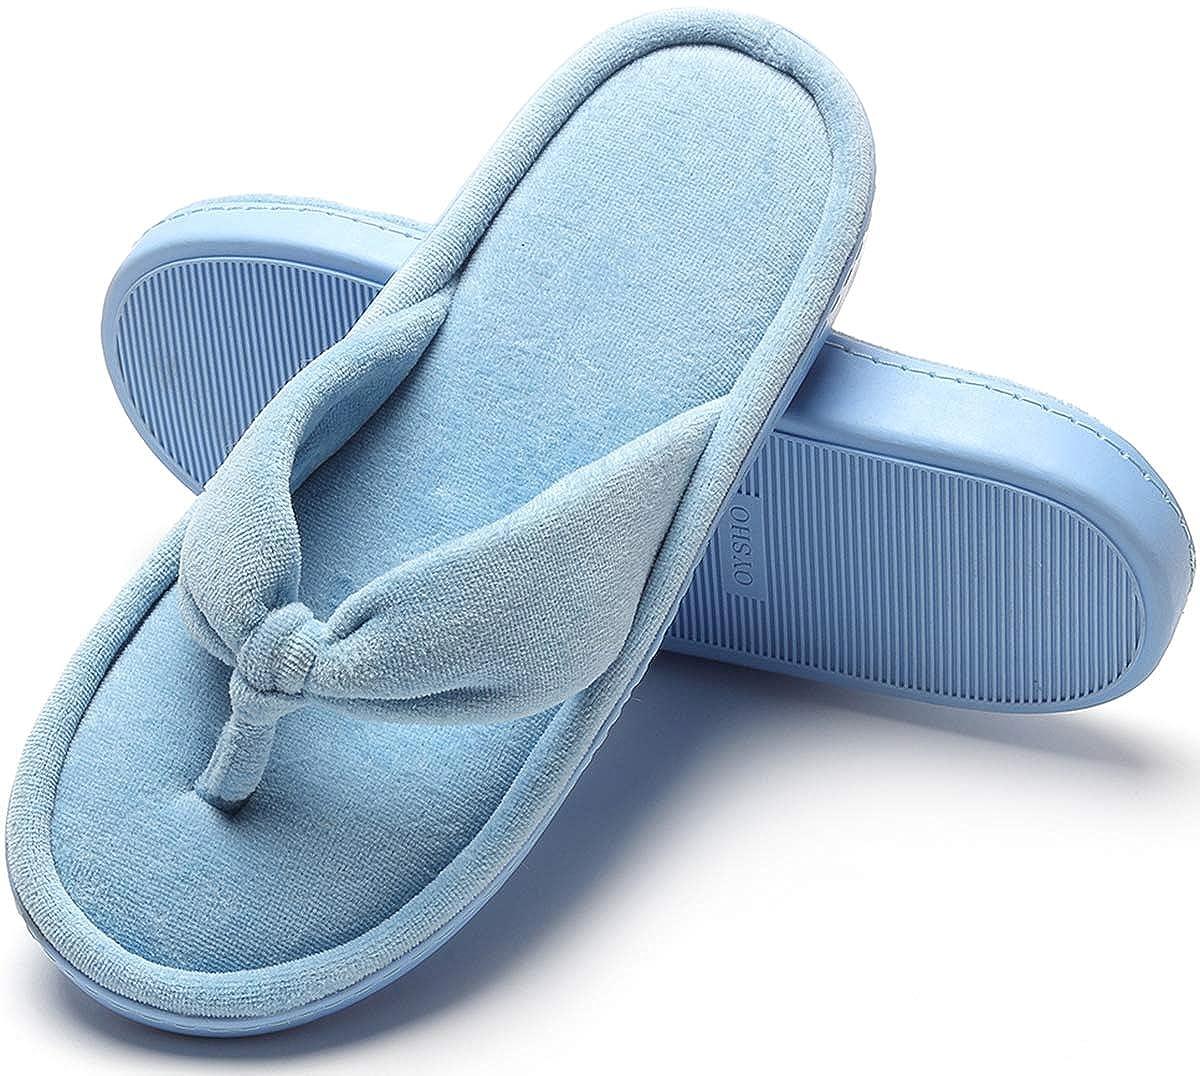 9f4485f22 Amazon.com  Slippers for Women